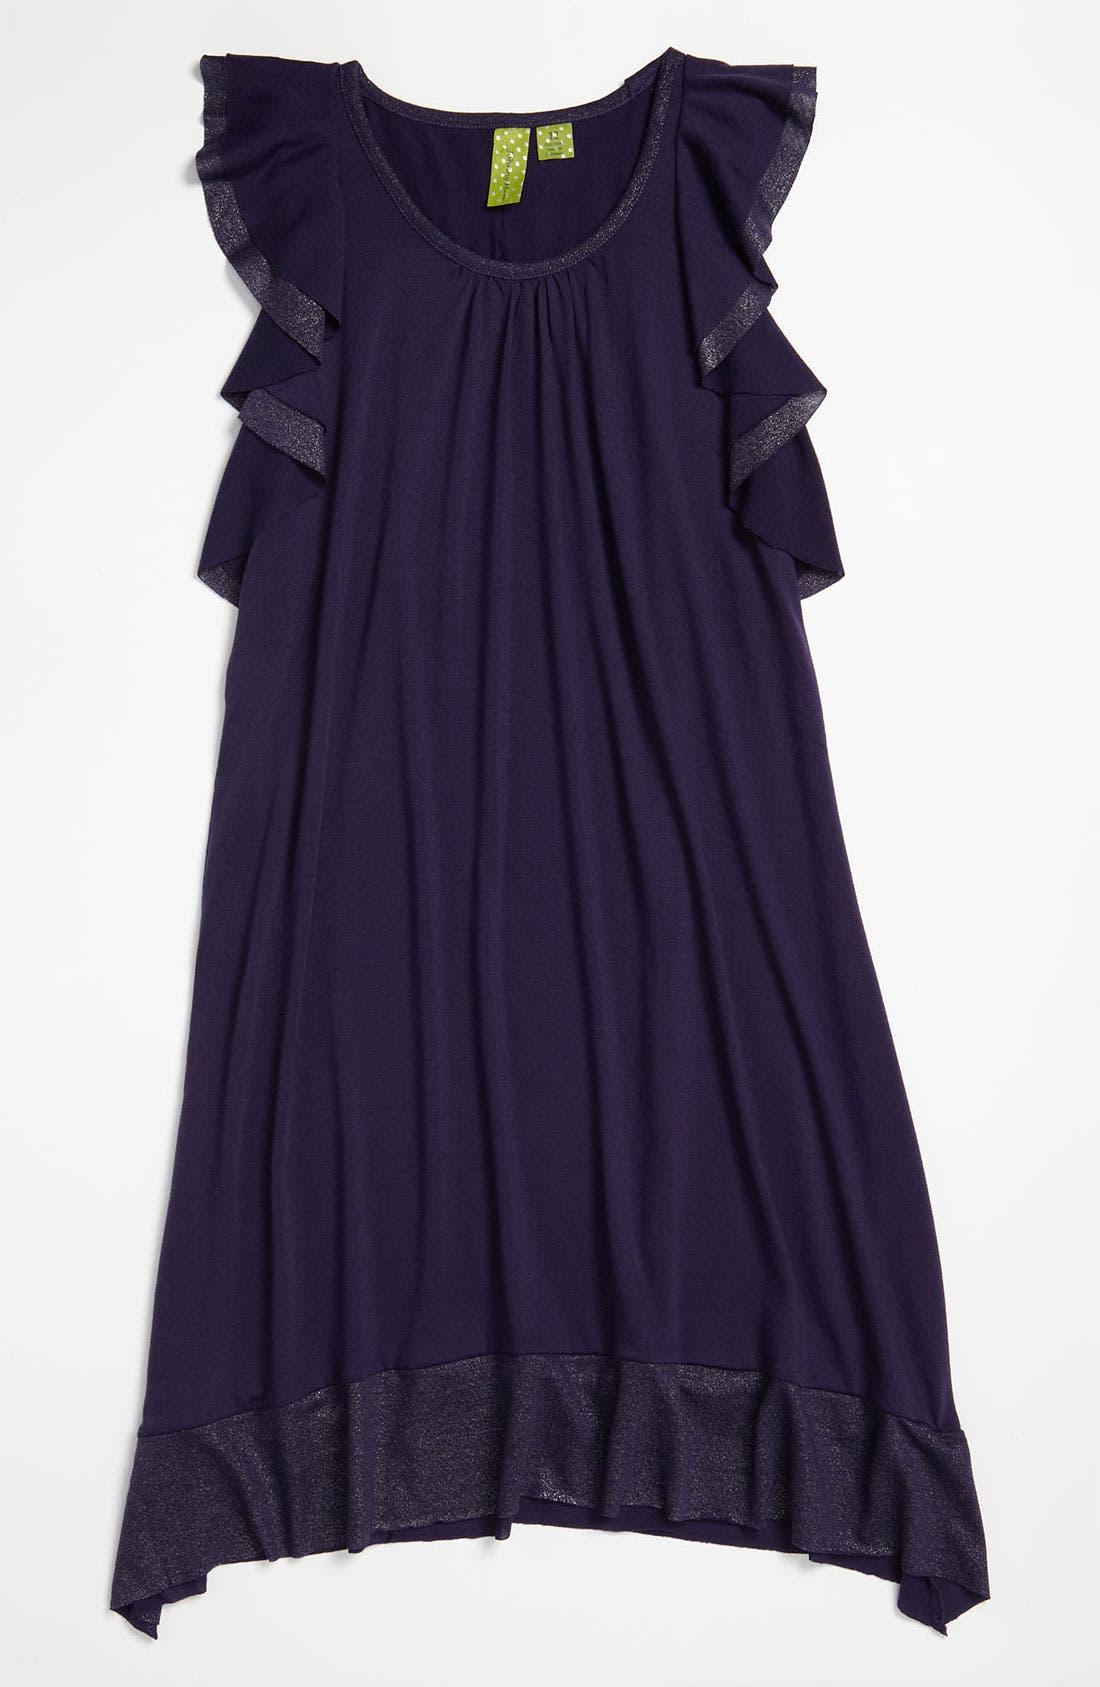 Alternate Image 1 Selected - Jonathan Martin Flutter Dress (Big Girls)